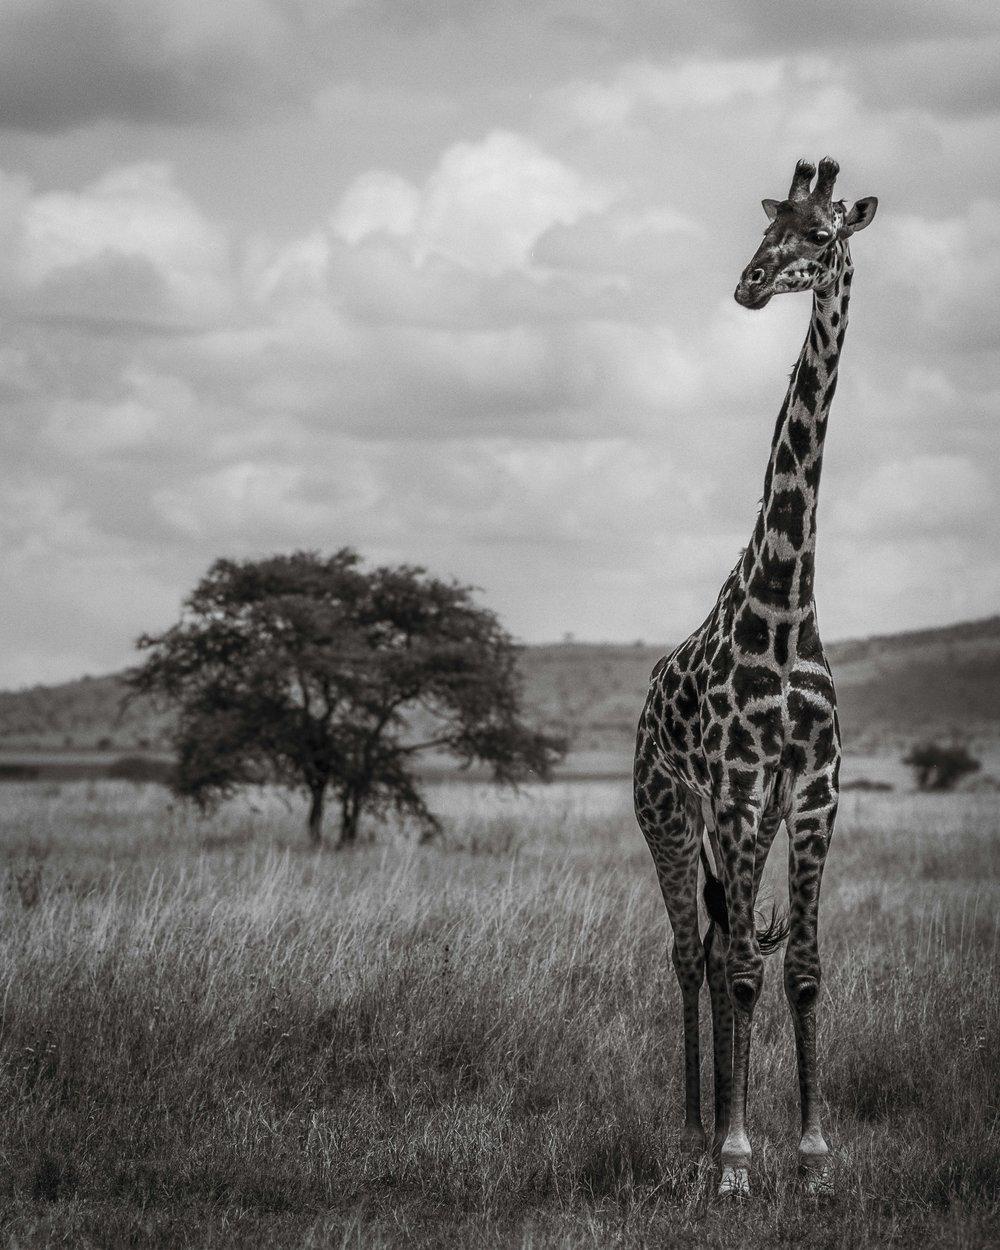 Giraffe Portrait - Serengeti National Park